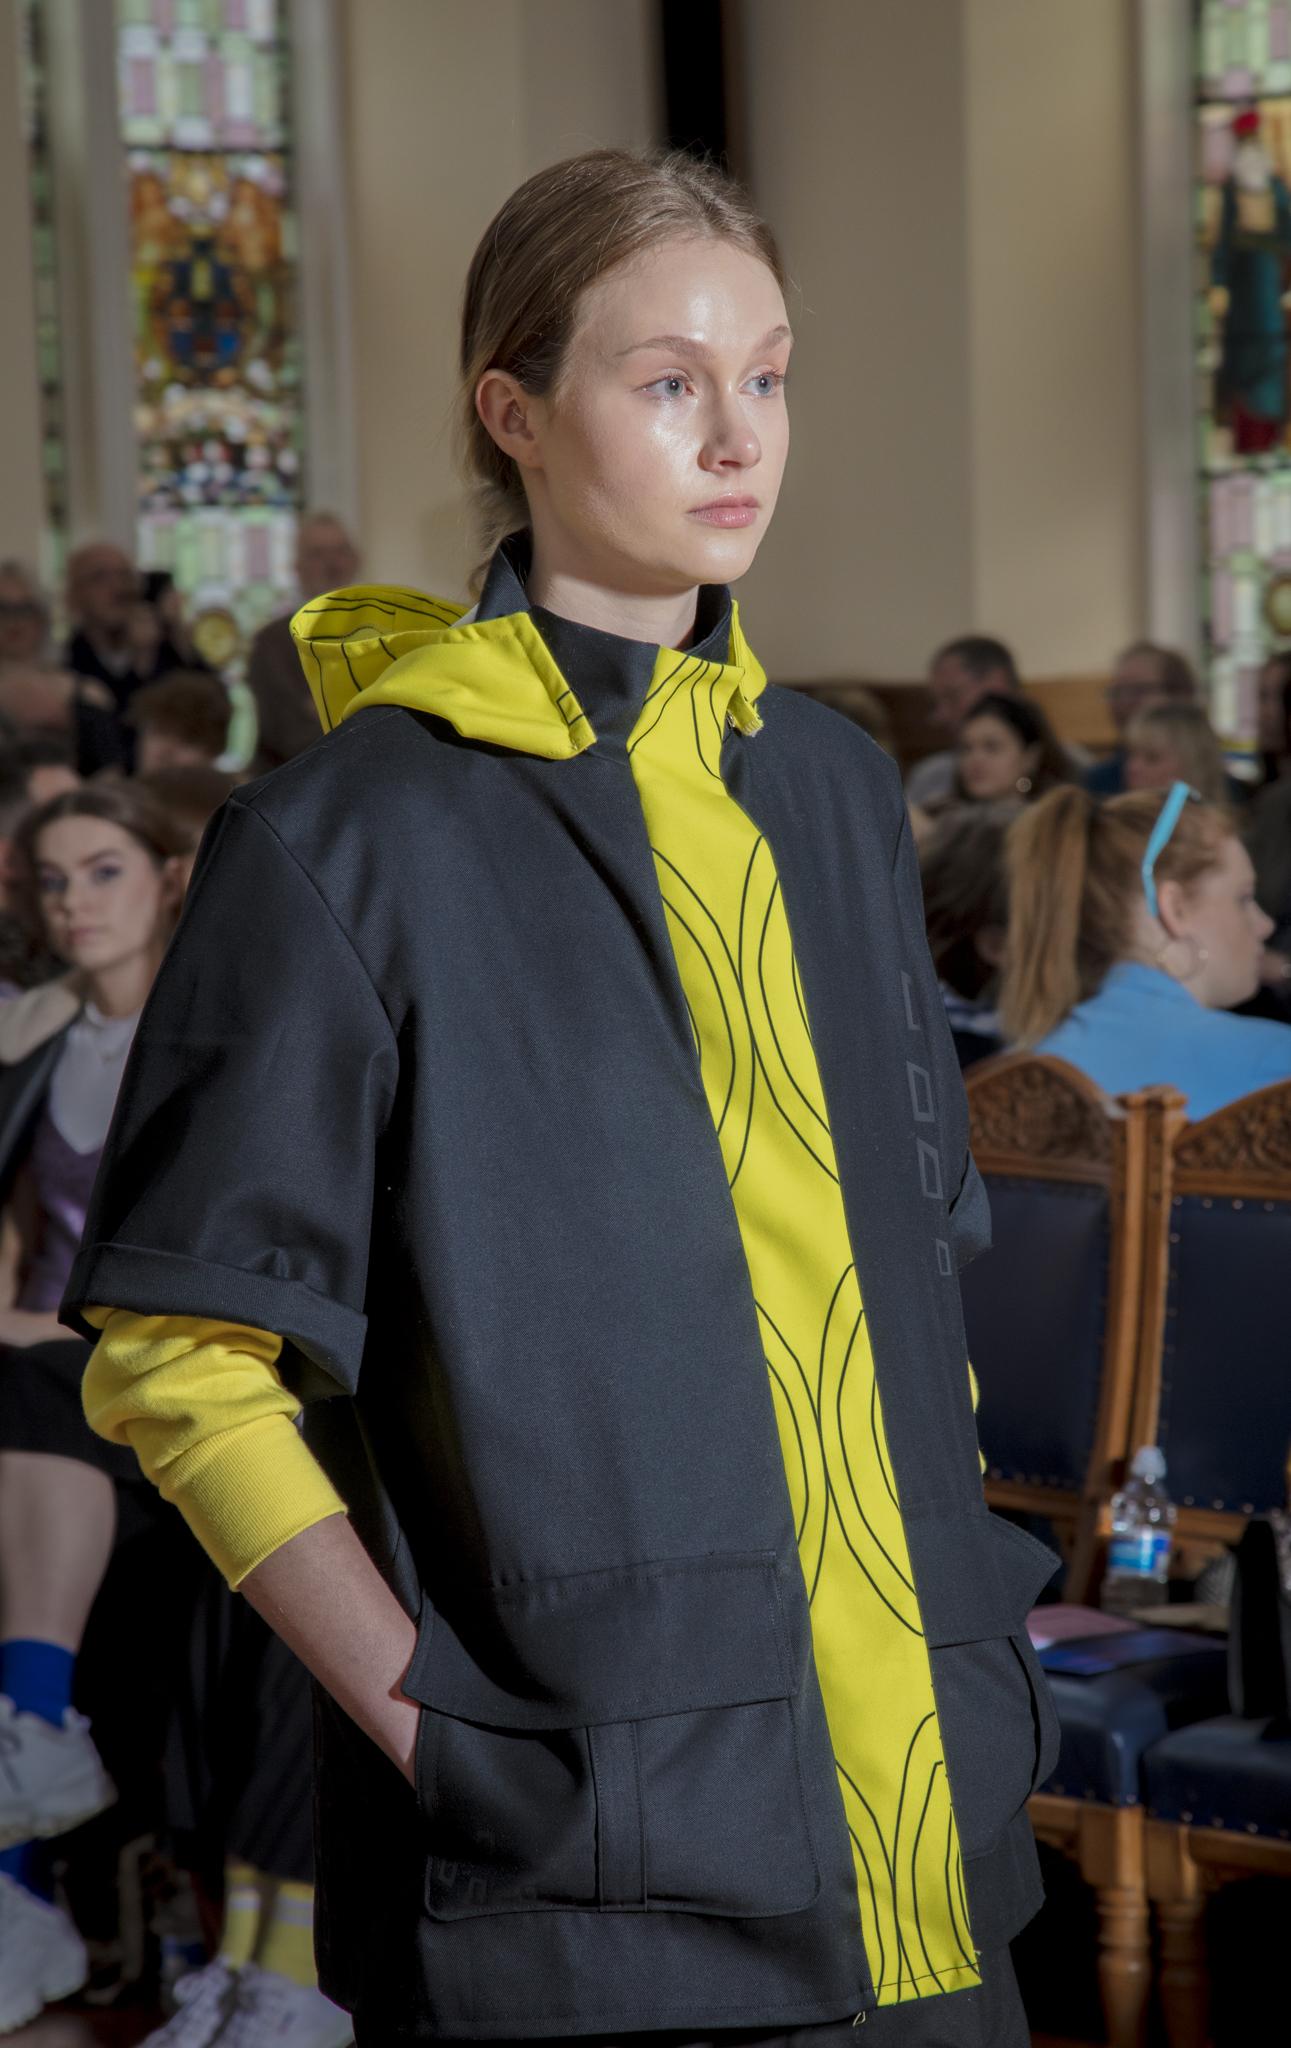 The Aberdeen Fashion Show 2019_44.JPG